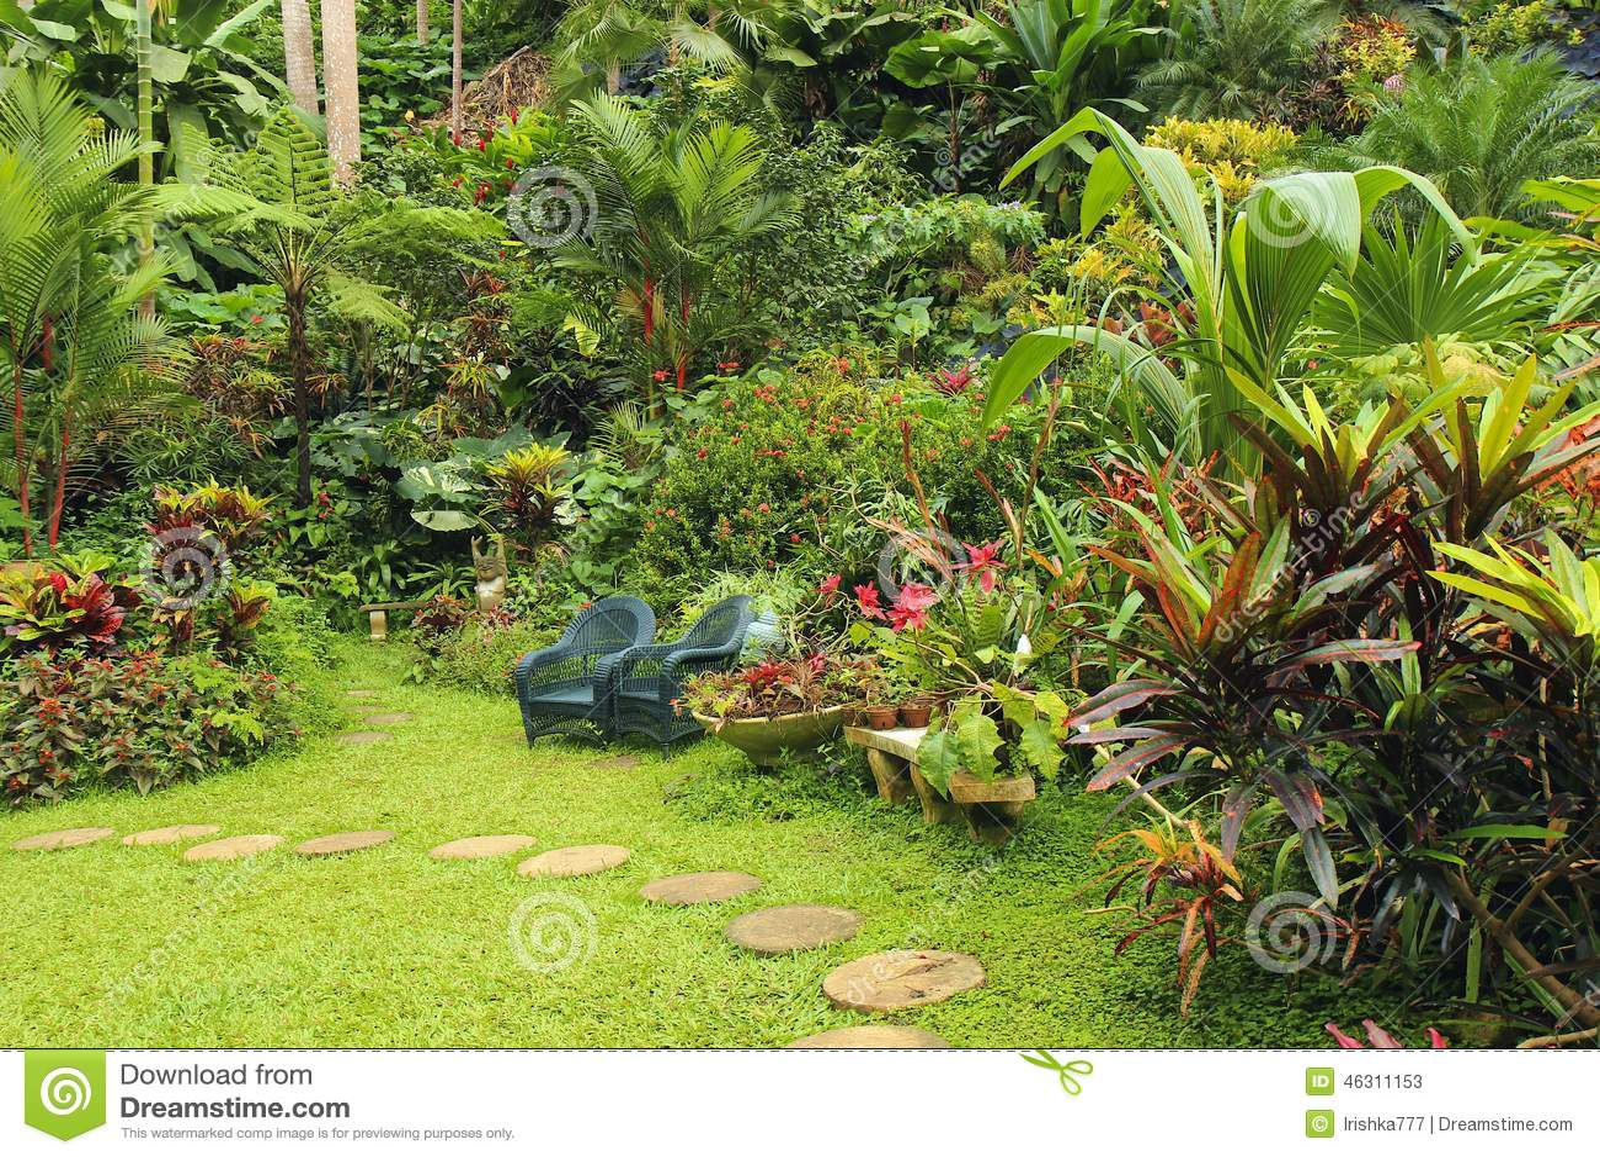 Jardin botanique en barbade des cara bes photo stock for Jardin botanique de conception